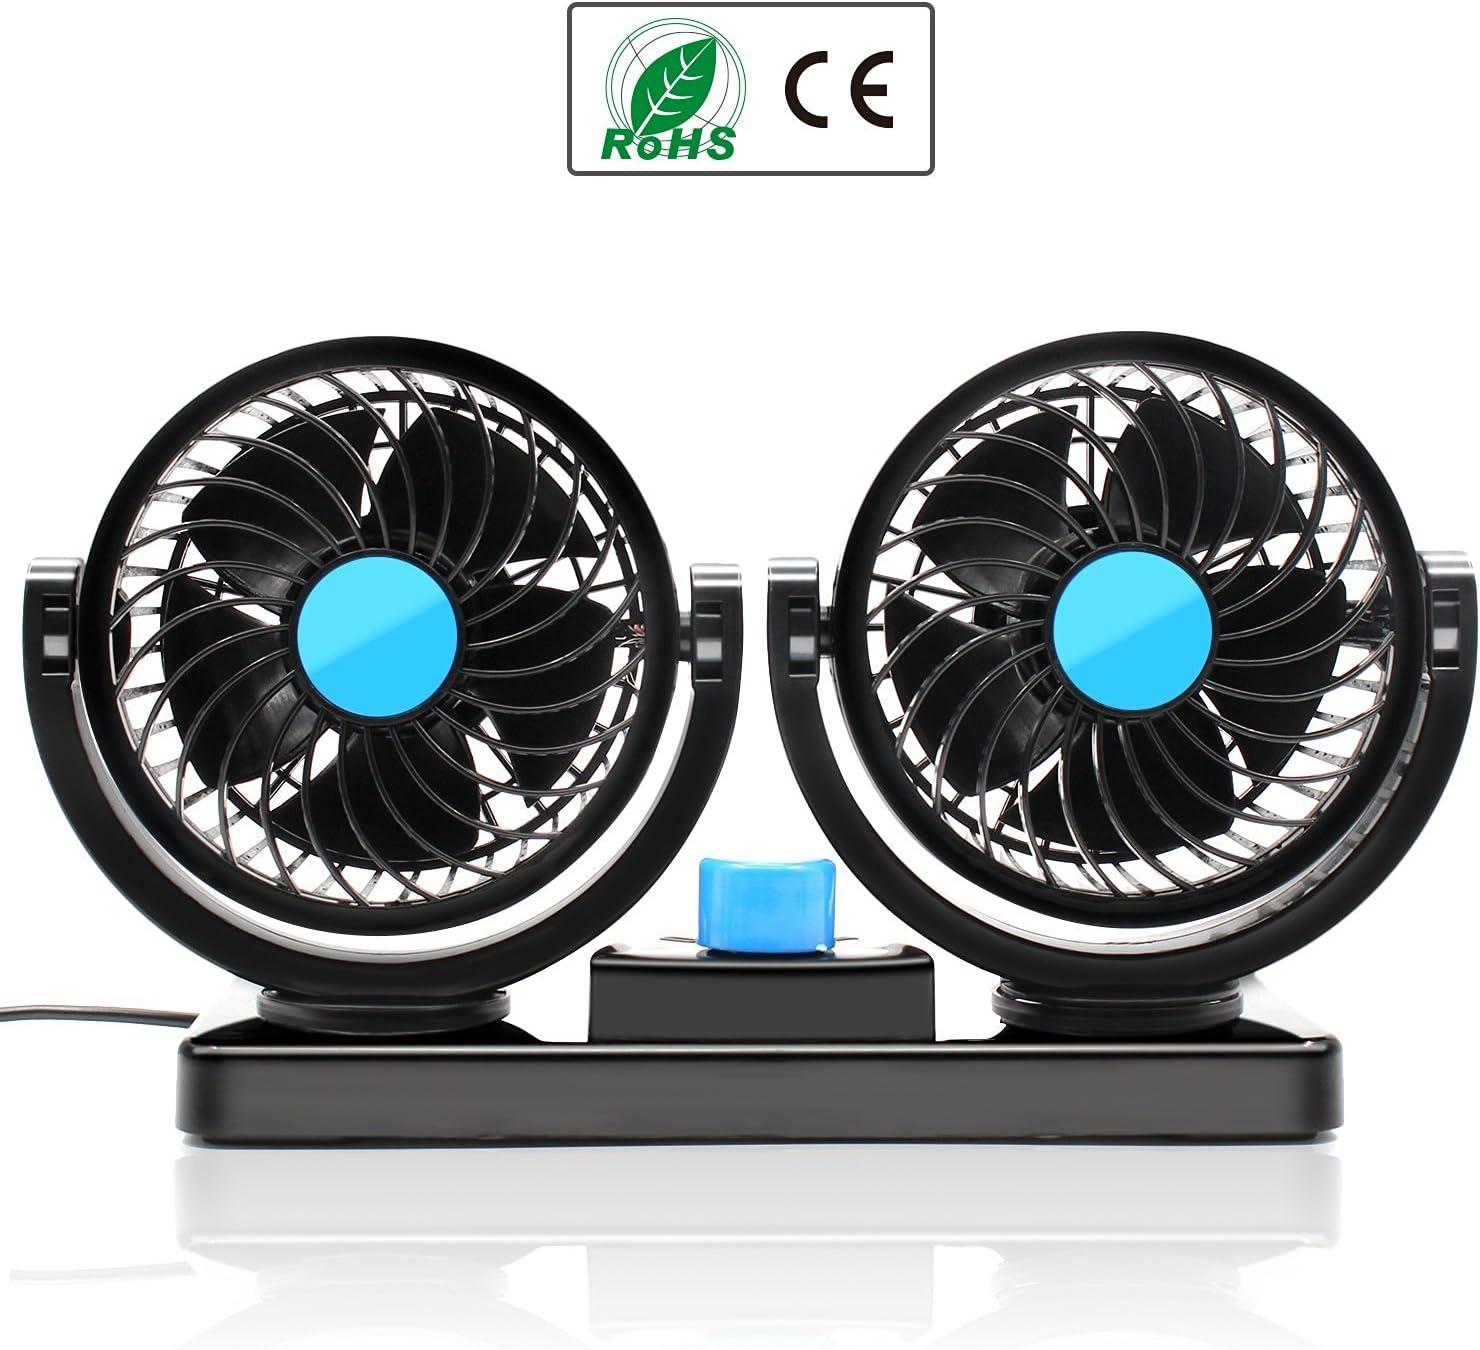 Ventilador para coches Almondcy de 2 velocidades ajustables, con sistema de doble cabeza, rotación de 360 grados, 12 V, refrigeración automática